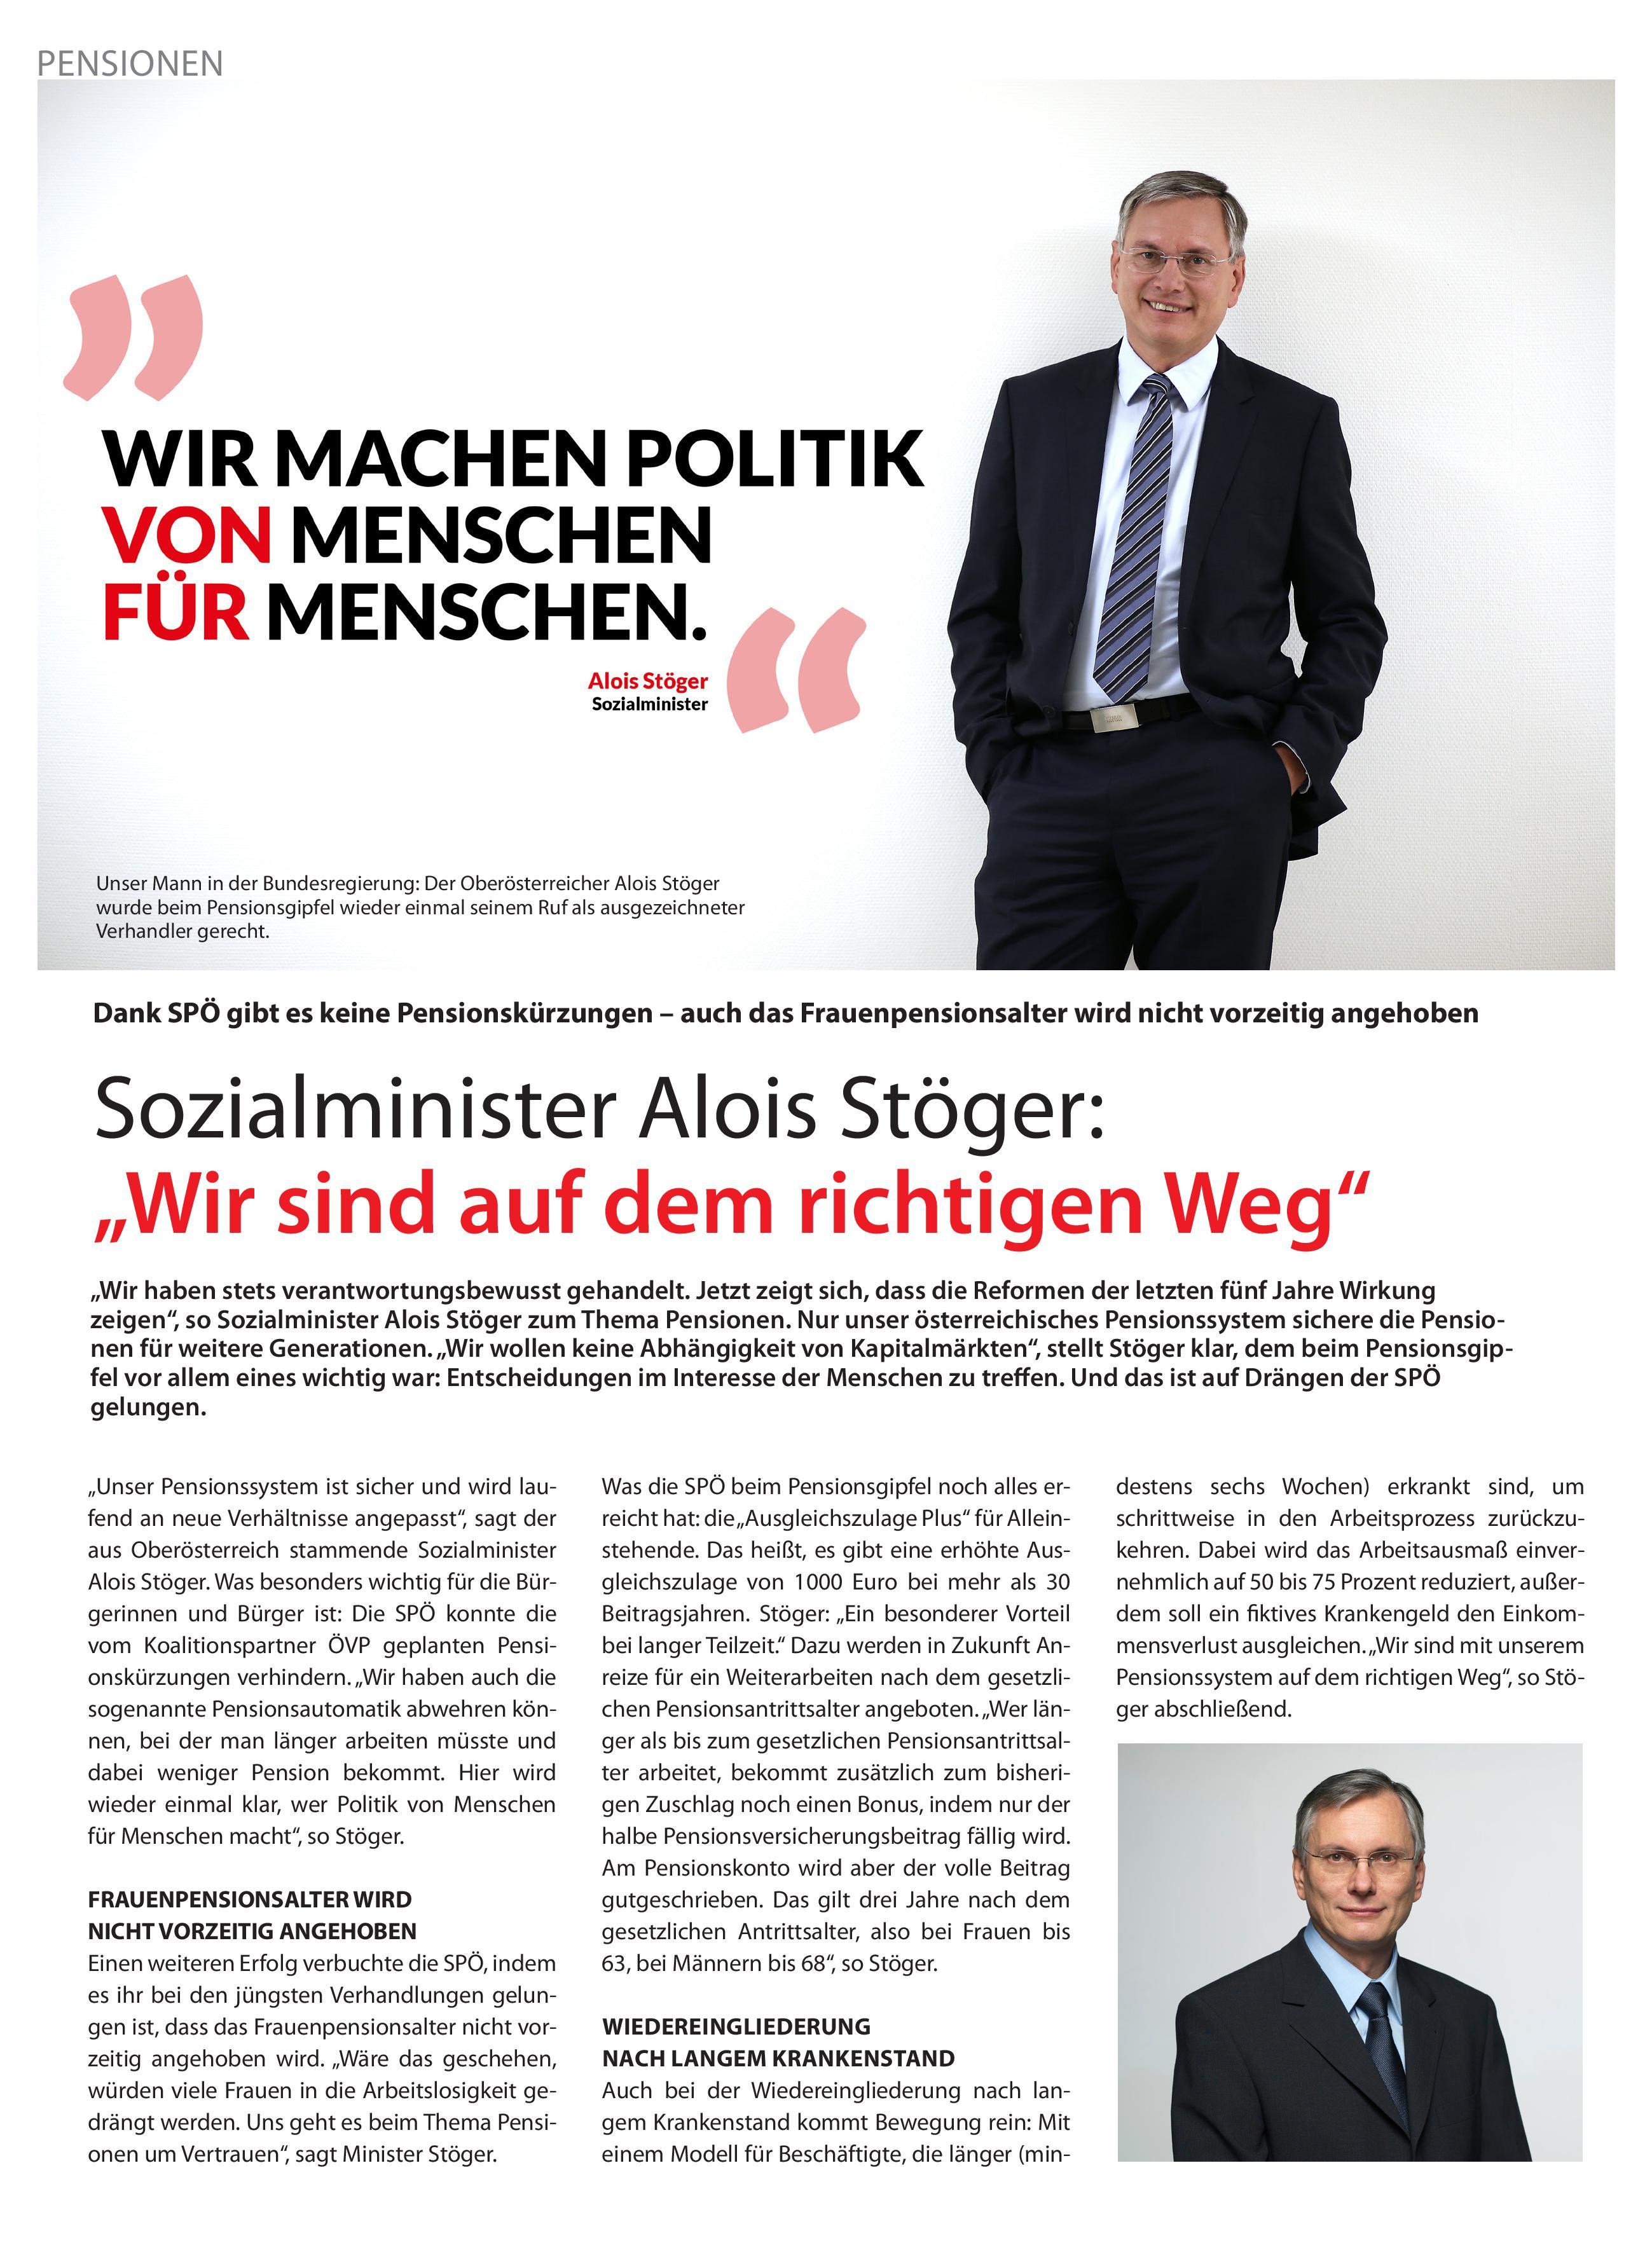 KORR_SPOOE_Pensiongipfel_Reindruckseite_DRUCK-page-001 (1)